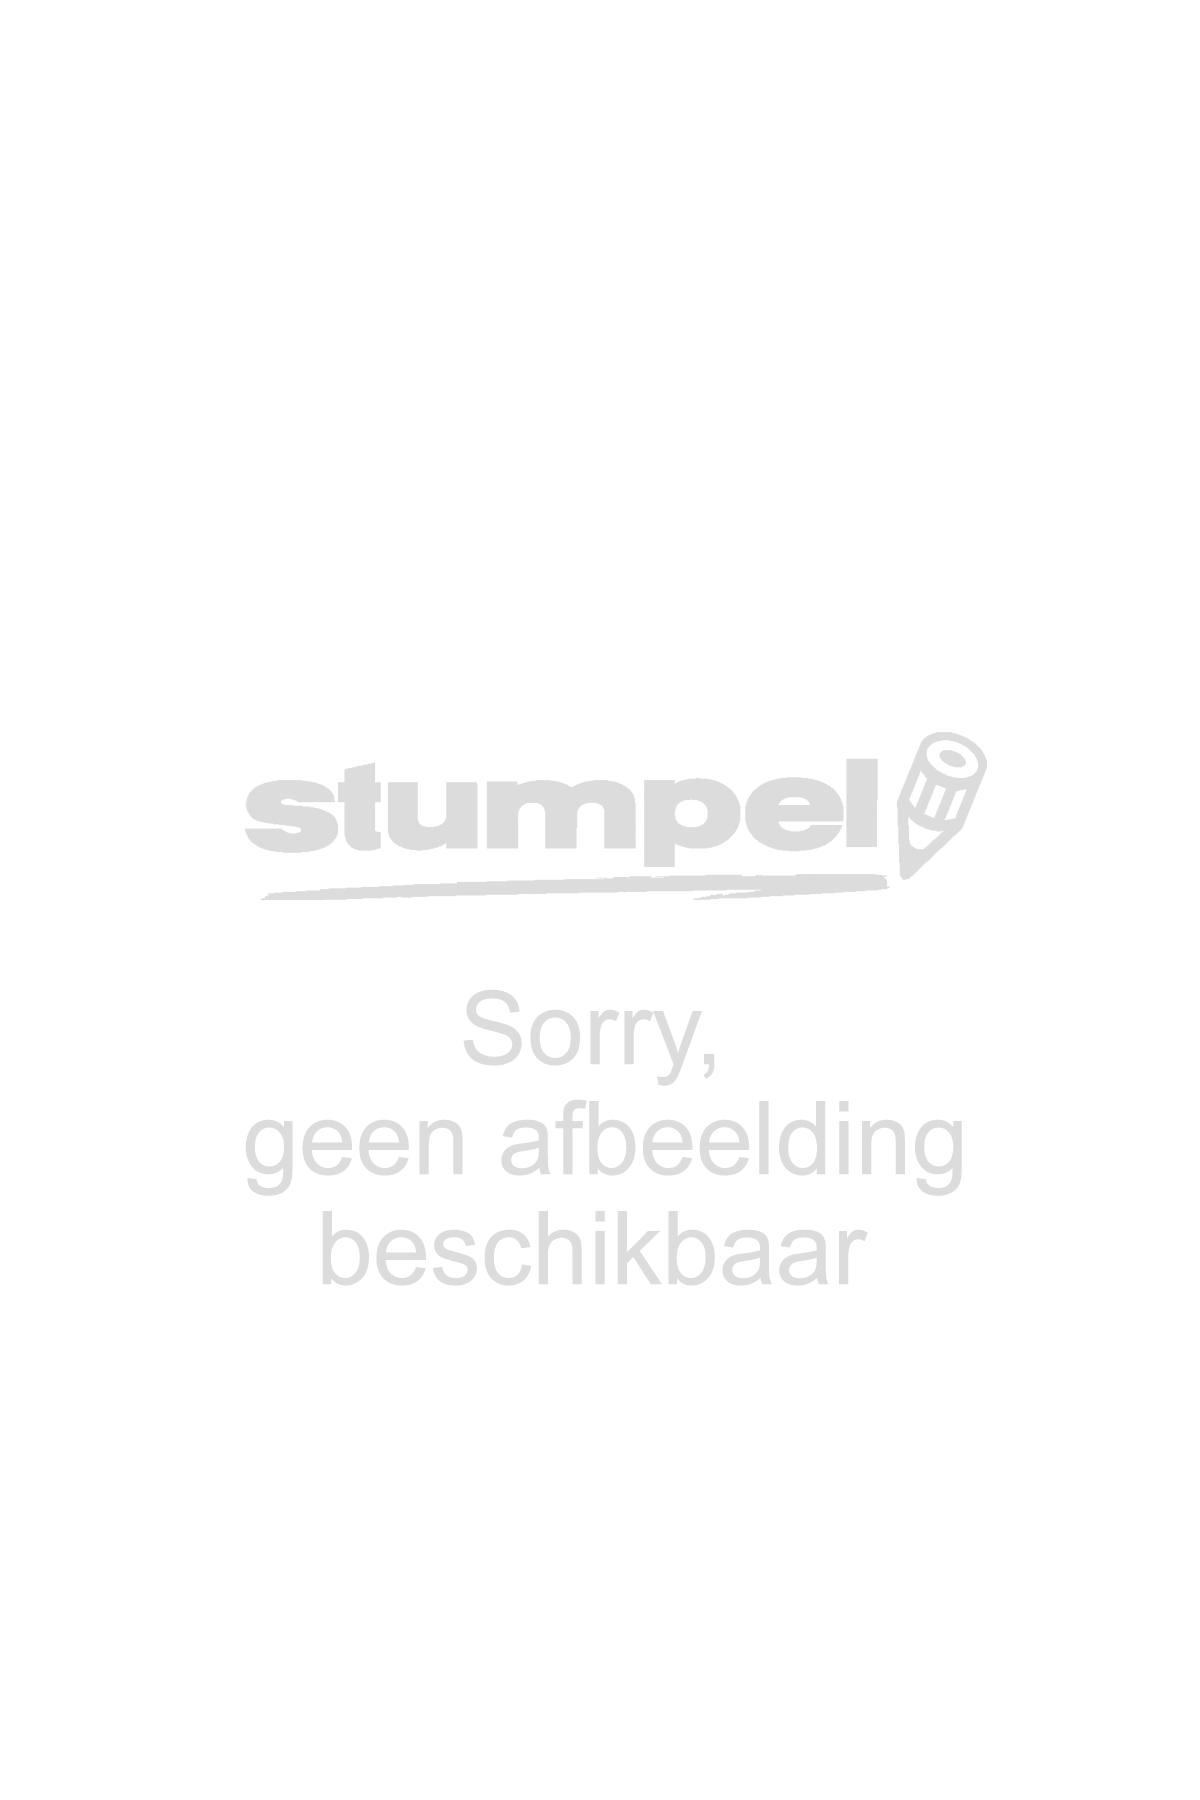 pinfeedetiket-herma-8161-88-9x35-7mm-1bns;-2000st-817302